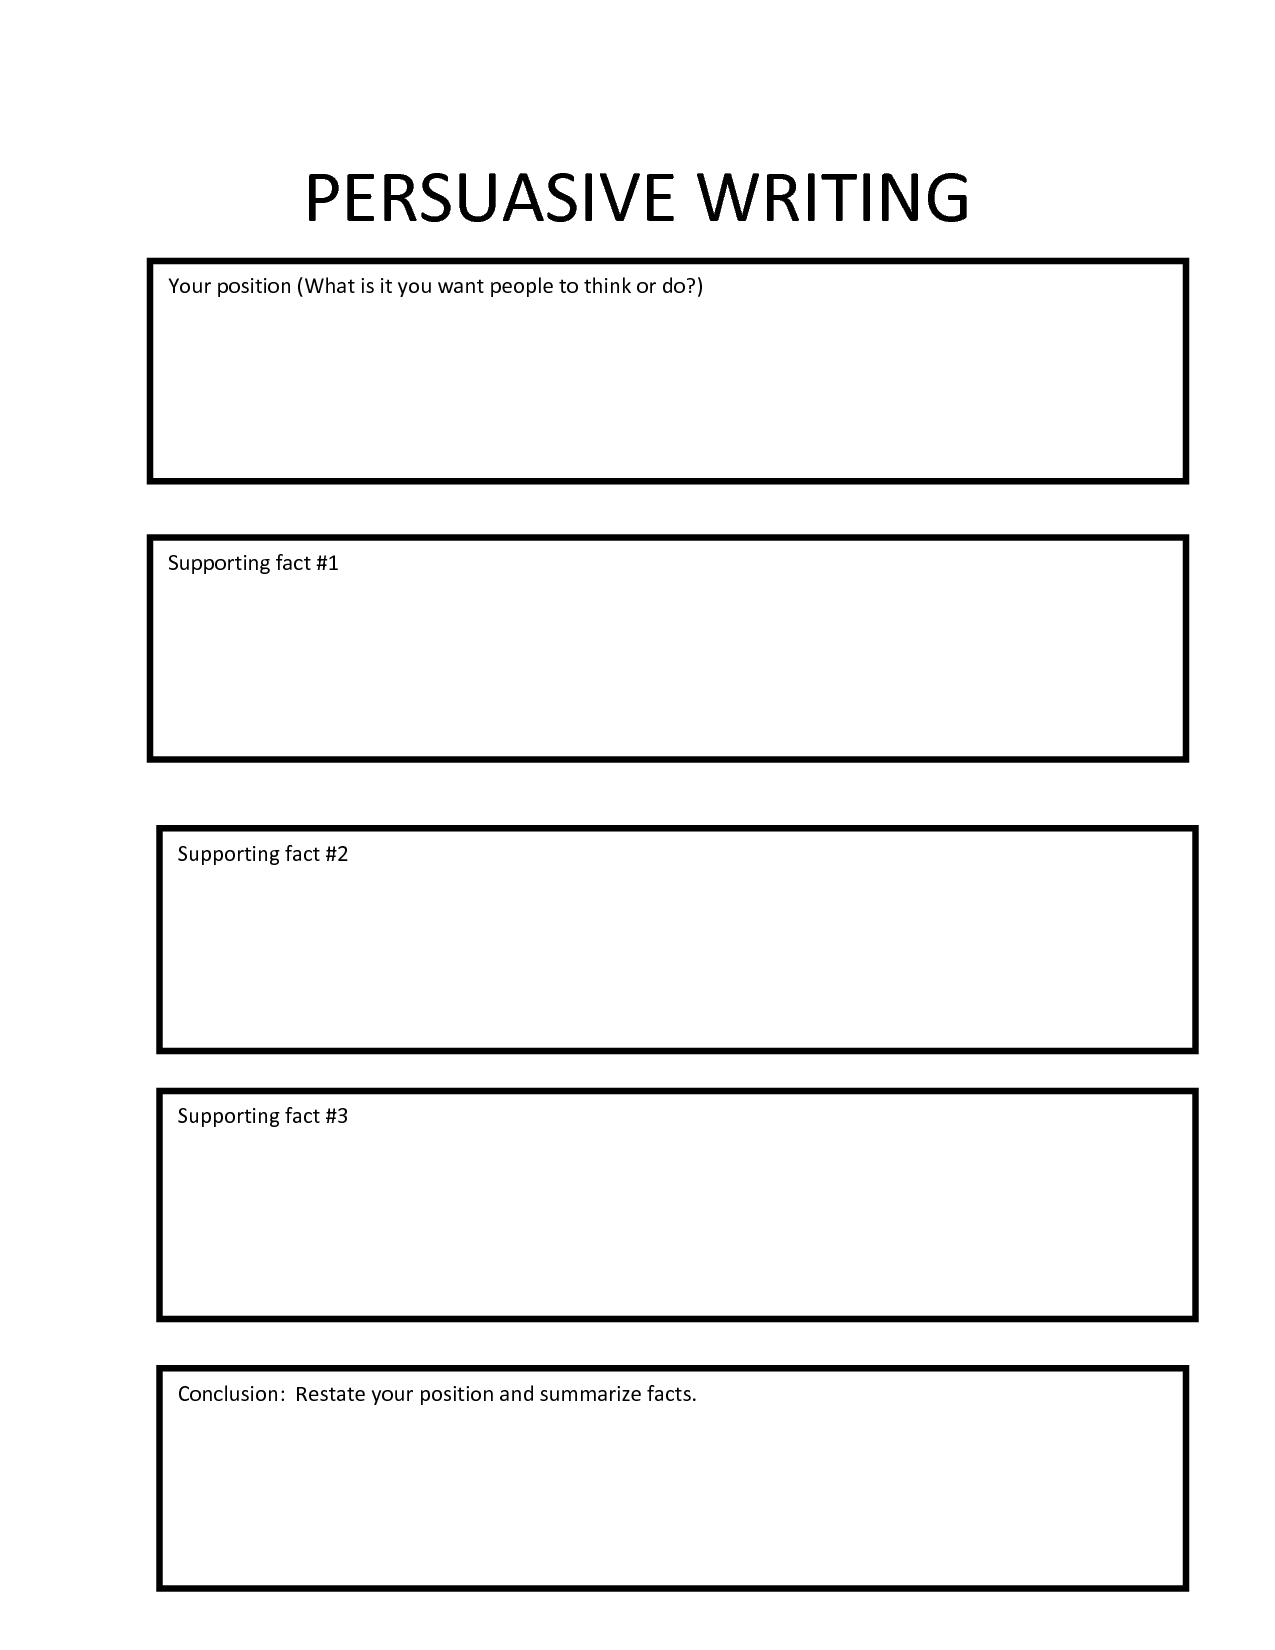 004 Persuasive Essay Graphic Organizer Amazing Argumentative Middle School Pdf Writing 5th Grade Answers Full